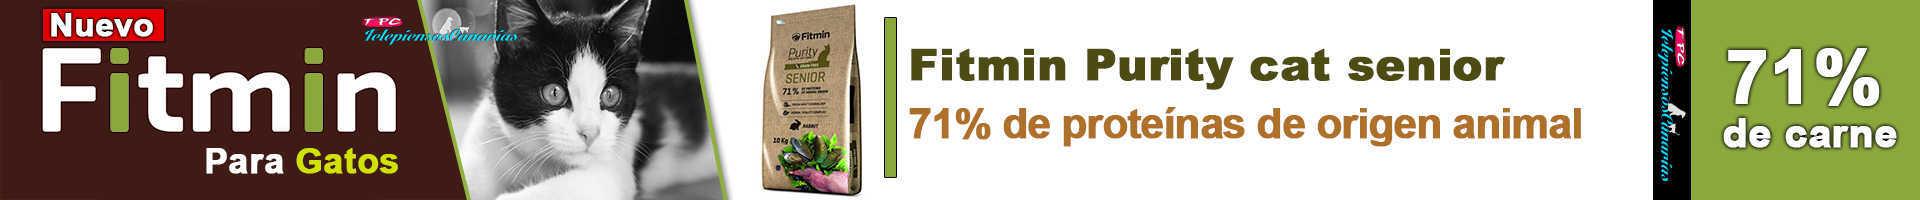 Fitmin Purity cat senior, indicado para gatos mayores